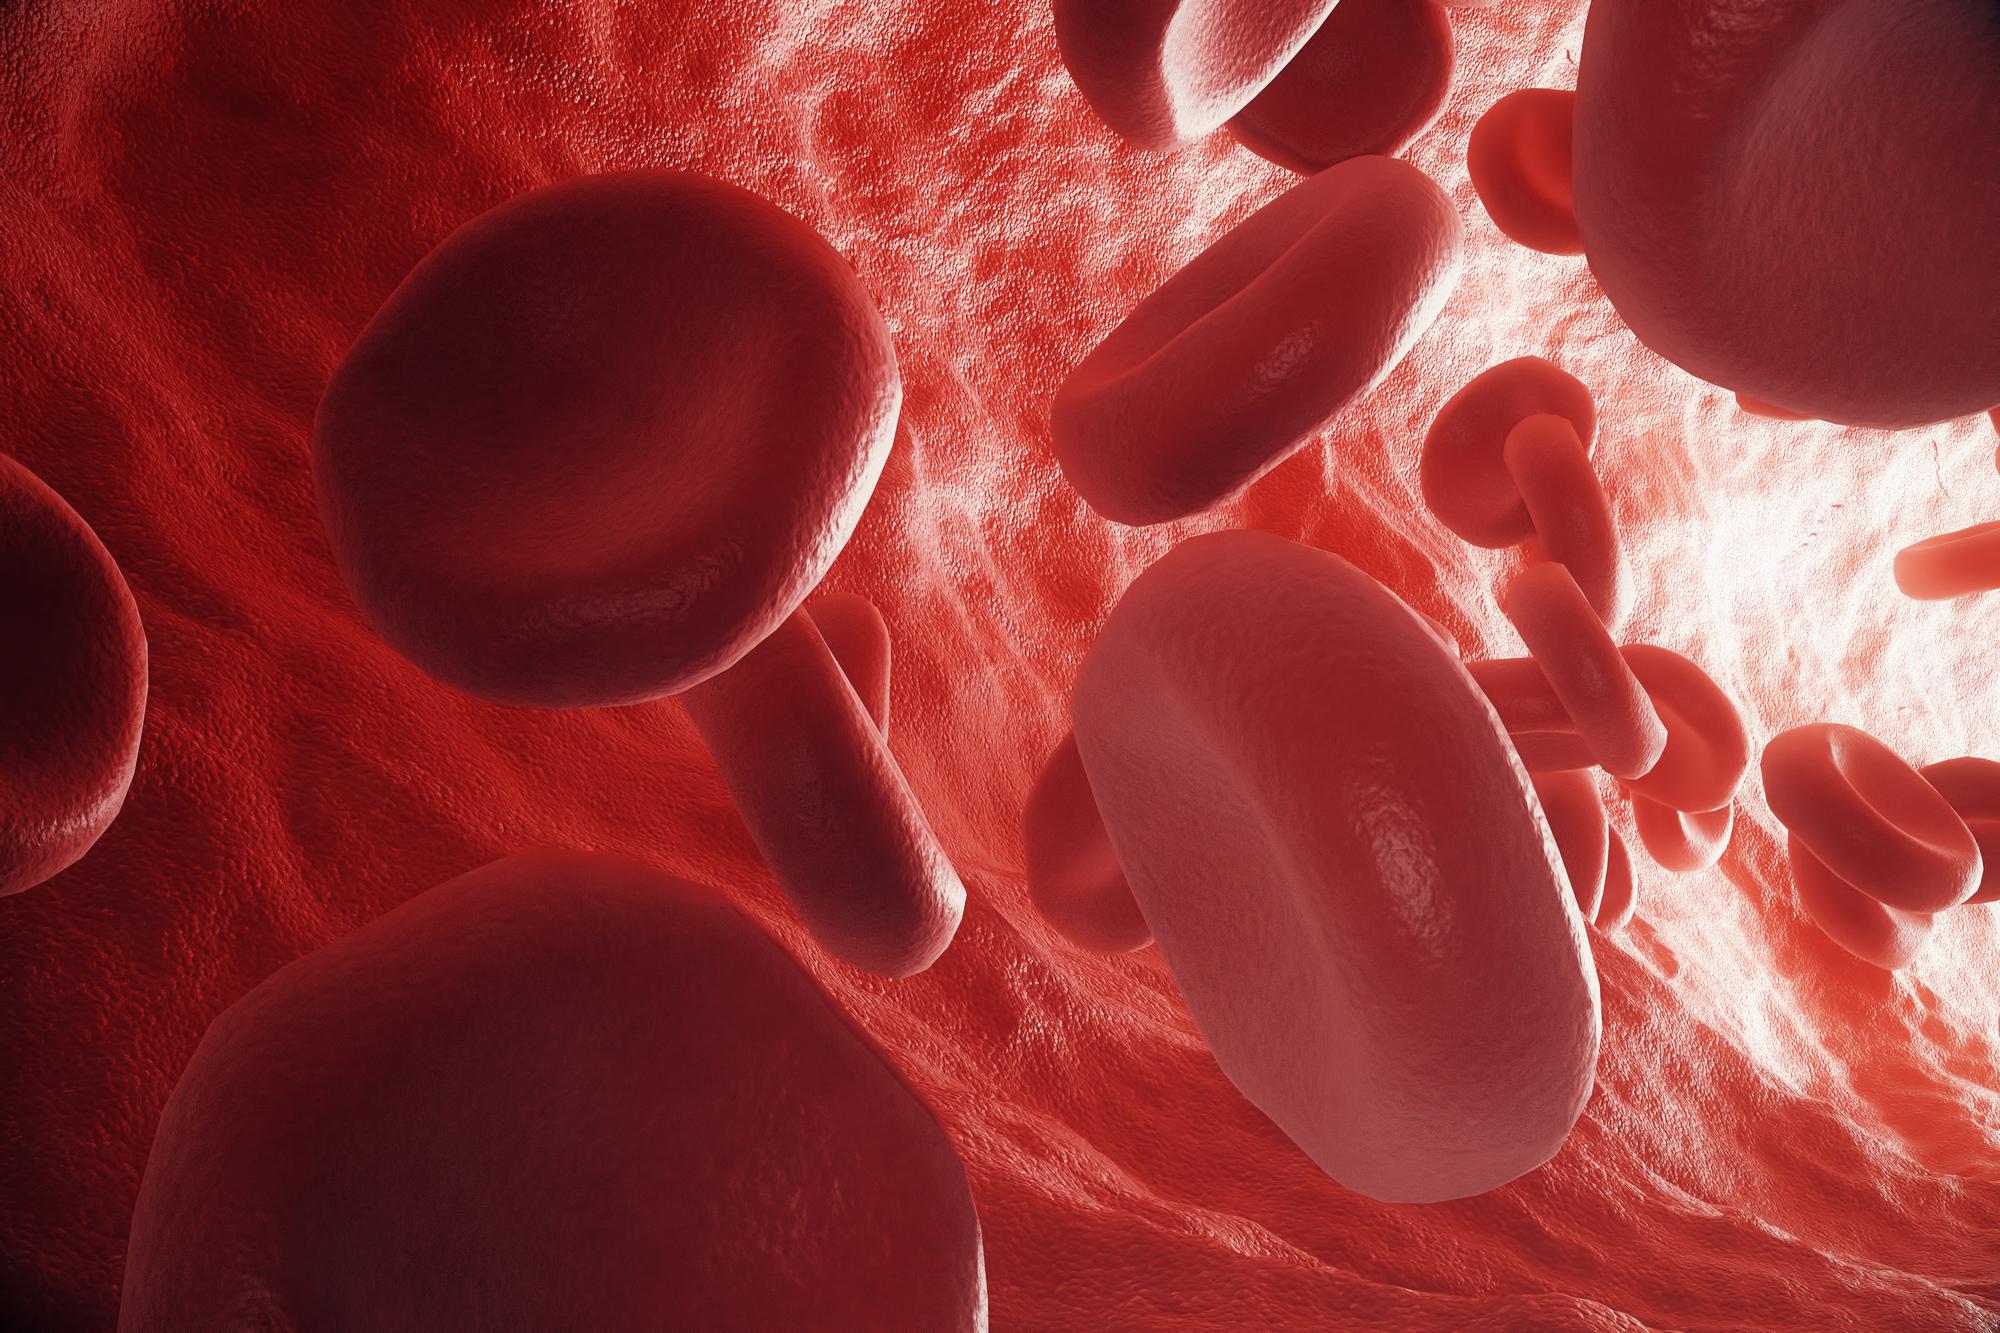 Red blood cells in vein or artery, flow inside inside a living organism. 3d rendering